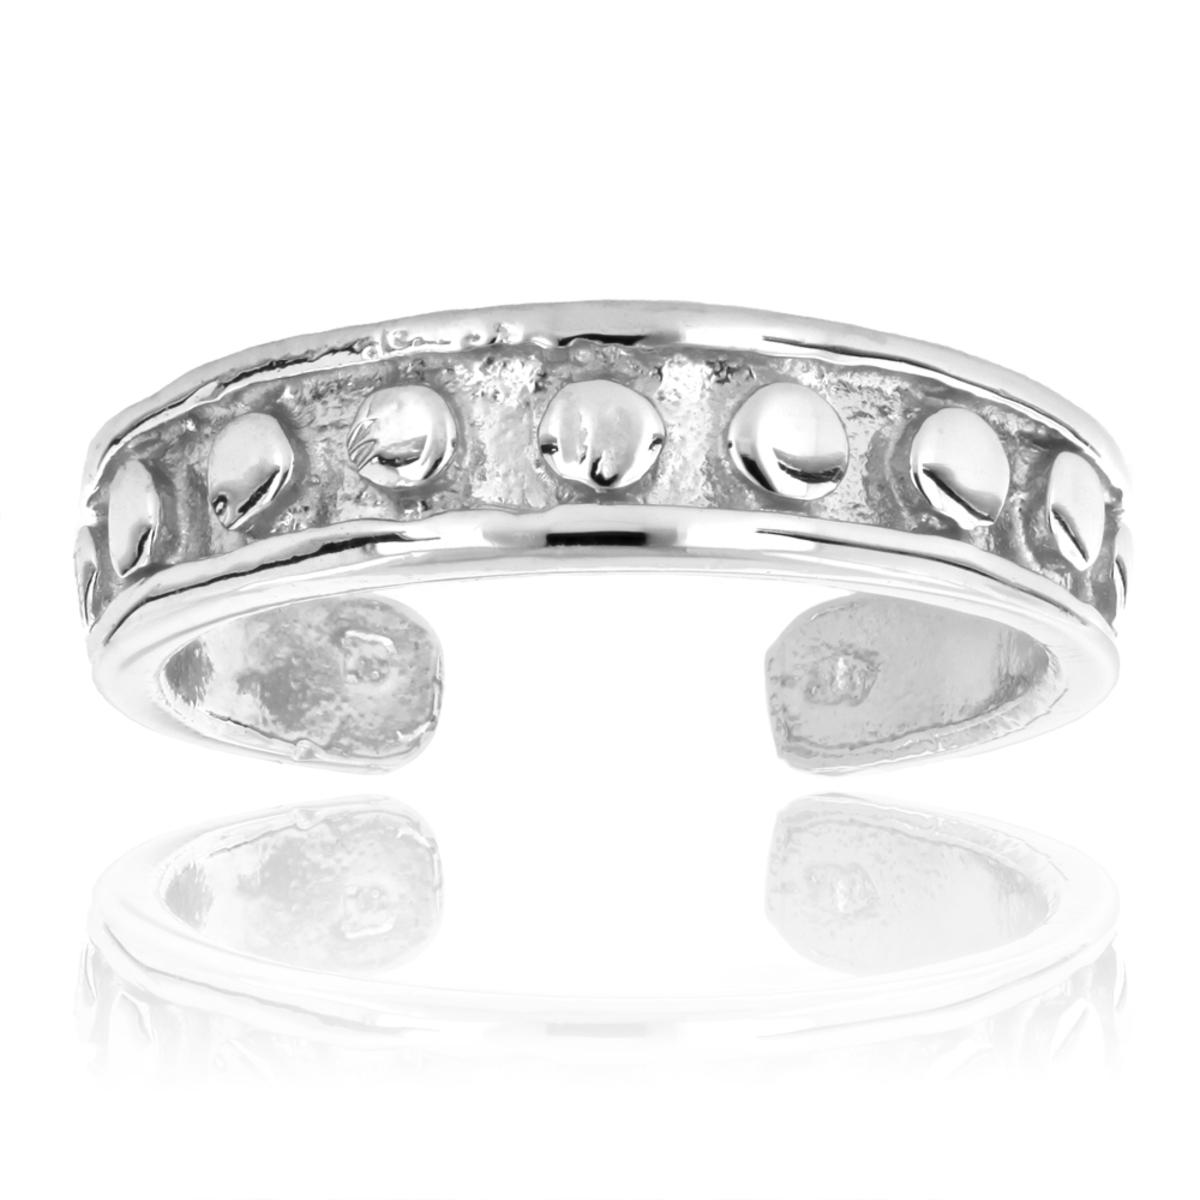 Beautiful Toe Rings Adjustable 14K Solid Gold Toe Ring